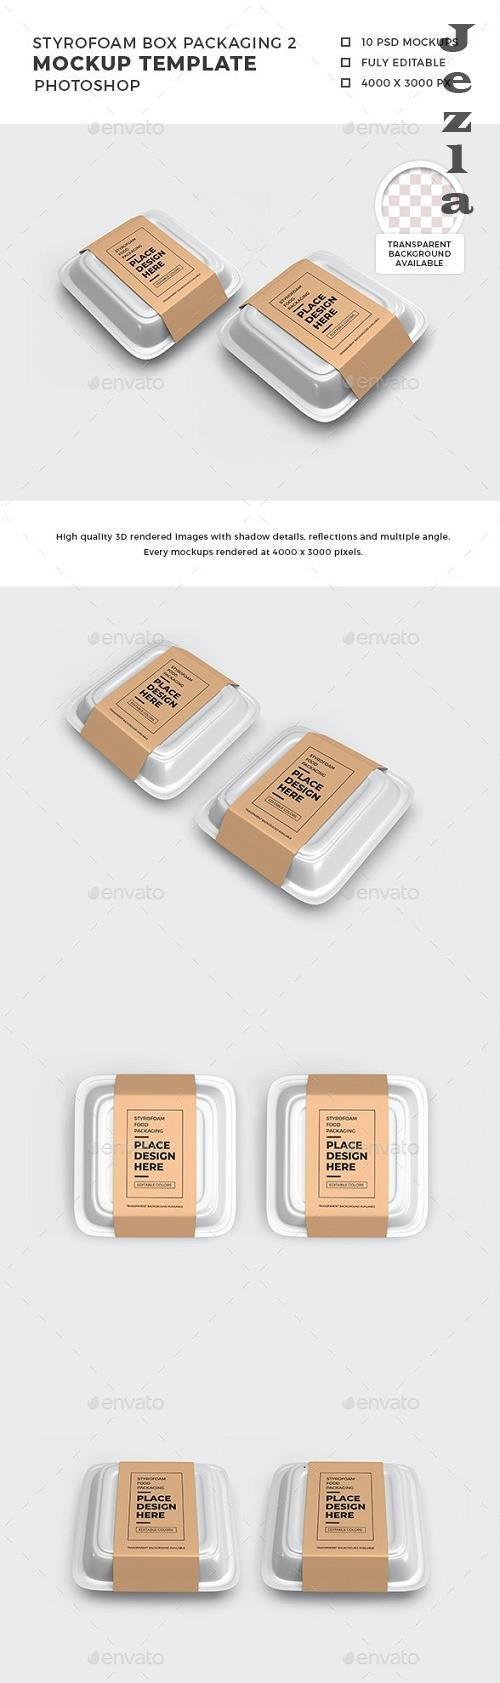 Styrofoam Box Packaging Mockup Template 2 - 32648819